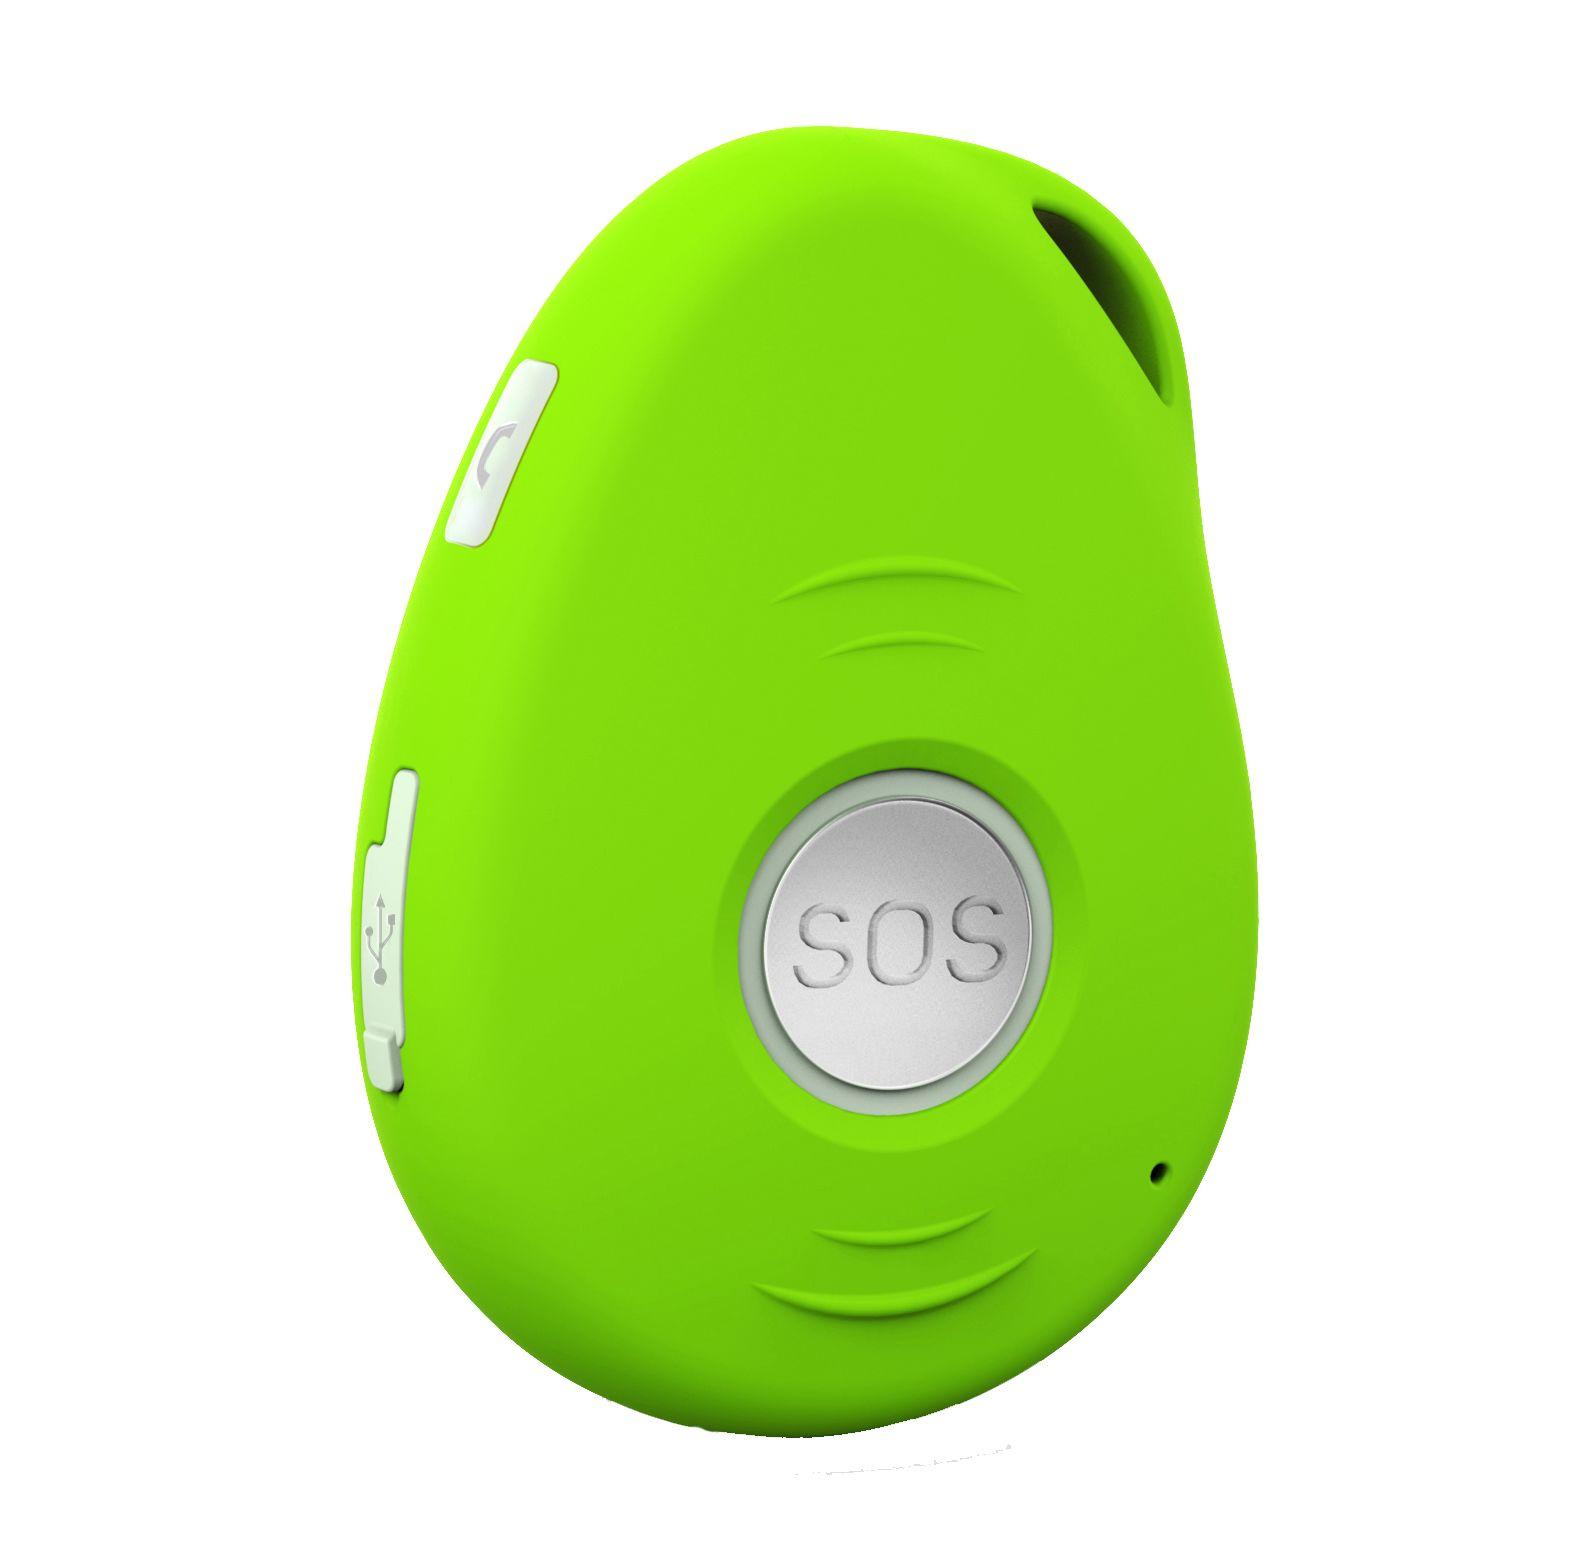 Vivago LOCATE GPS tracking